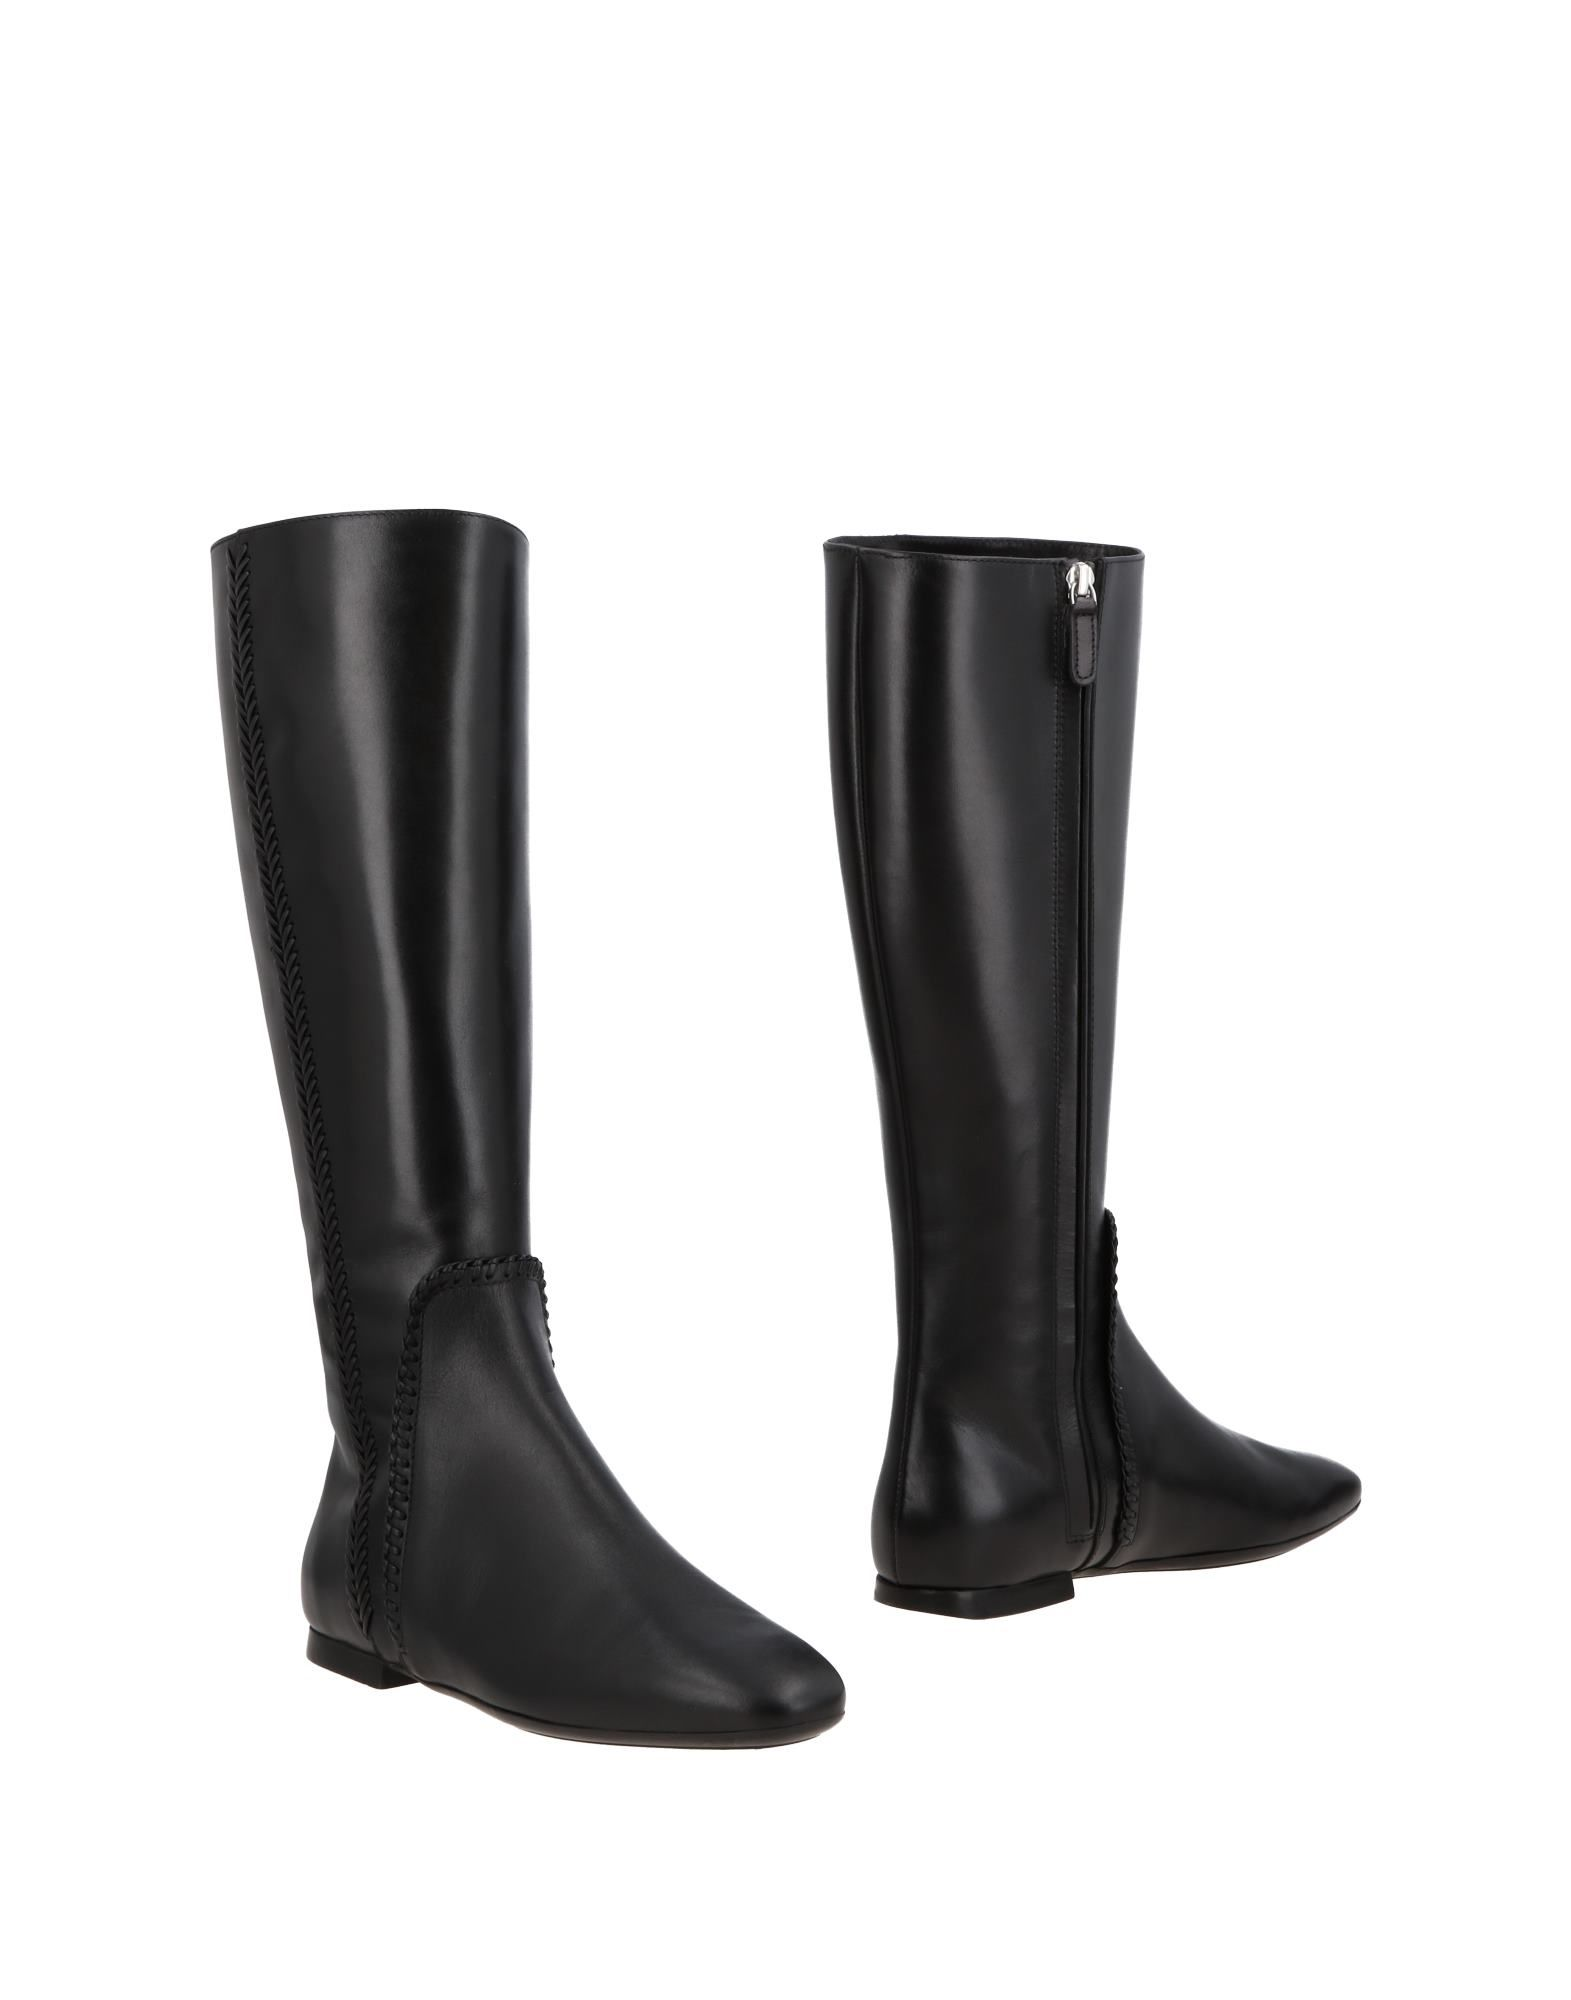 Tod's Boots - on Women Tod's Boots online on -  Australia - 11485093BJ 64c0c8